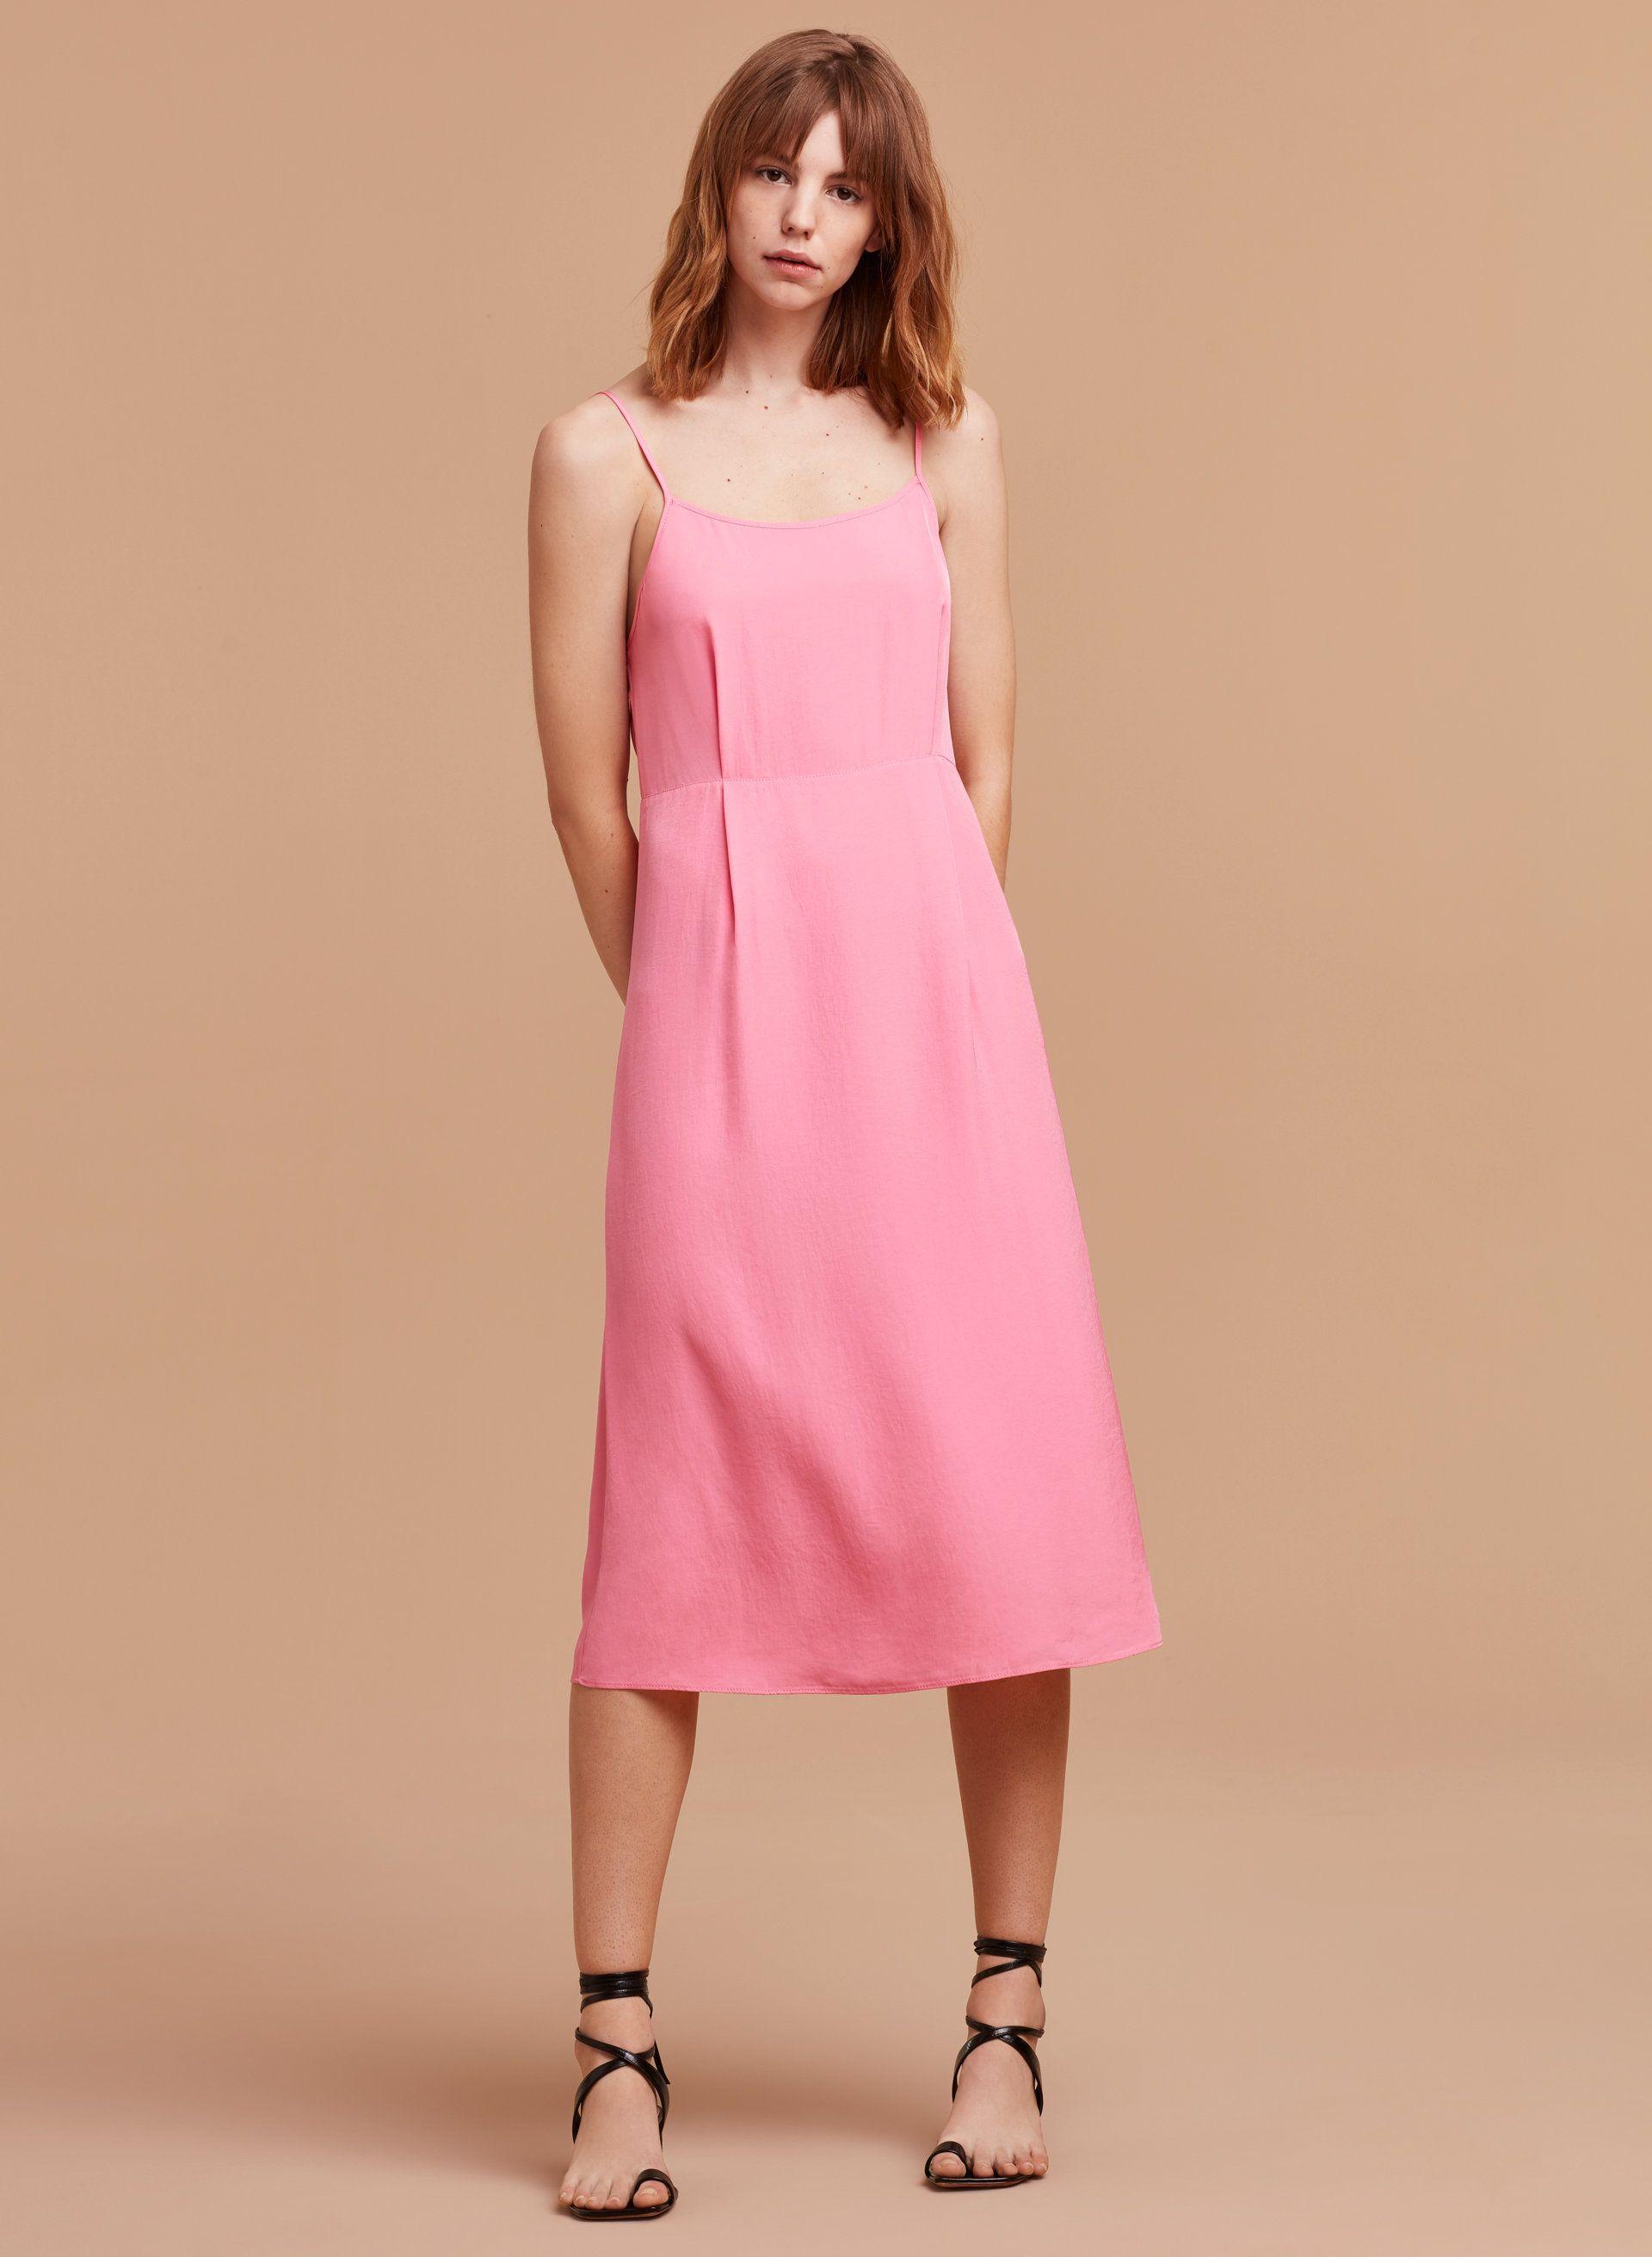 Lujoso Vestidos De Dama En Nottingham Modelo - Ideas de Estilos de ...